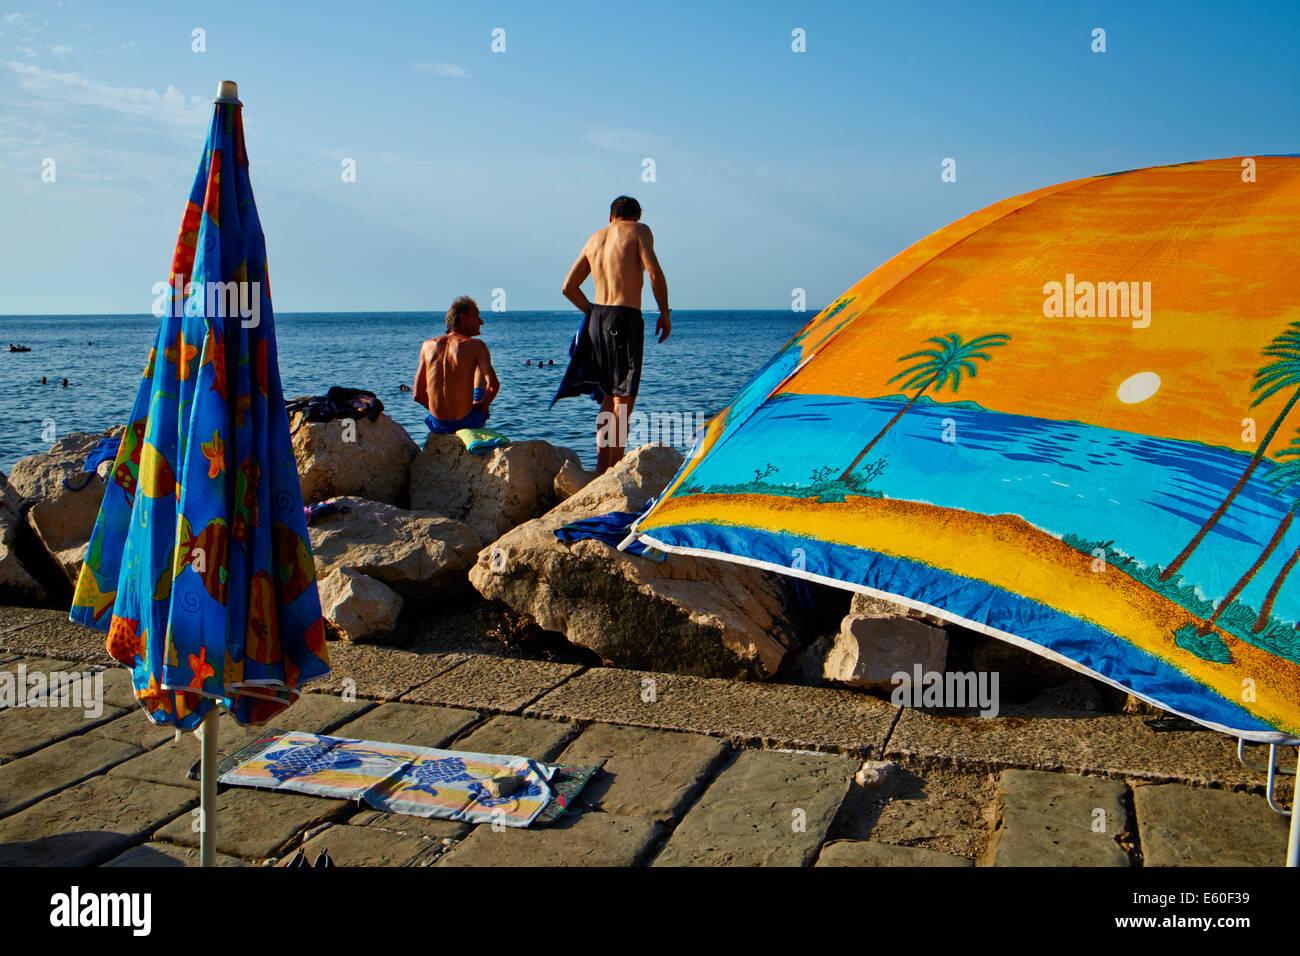 Slovenia, Primorska region, Adriatic Coast, Piran - Stock Image